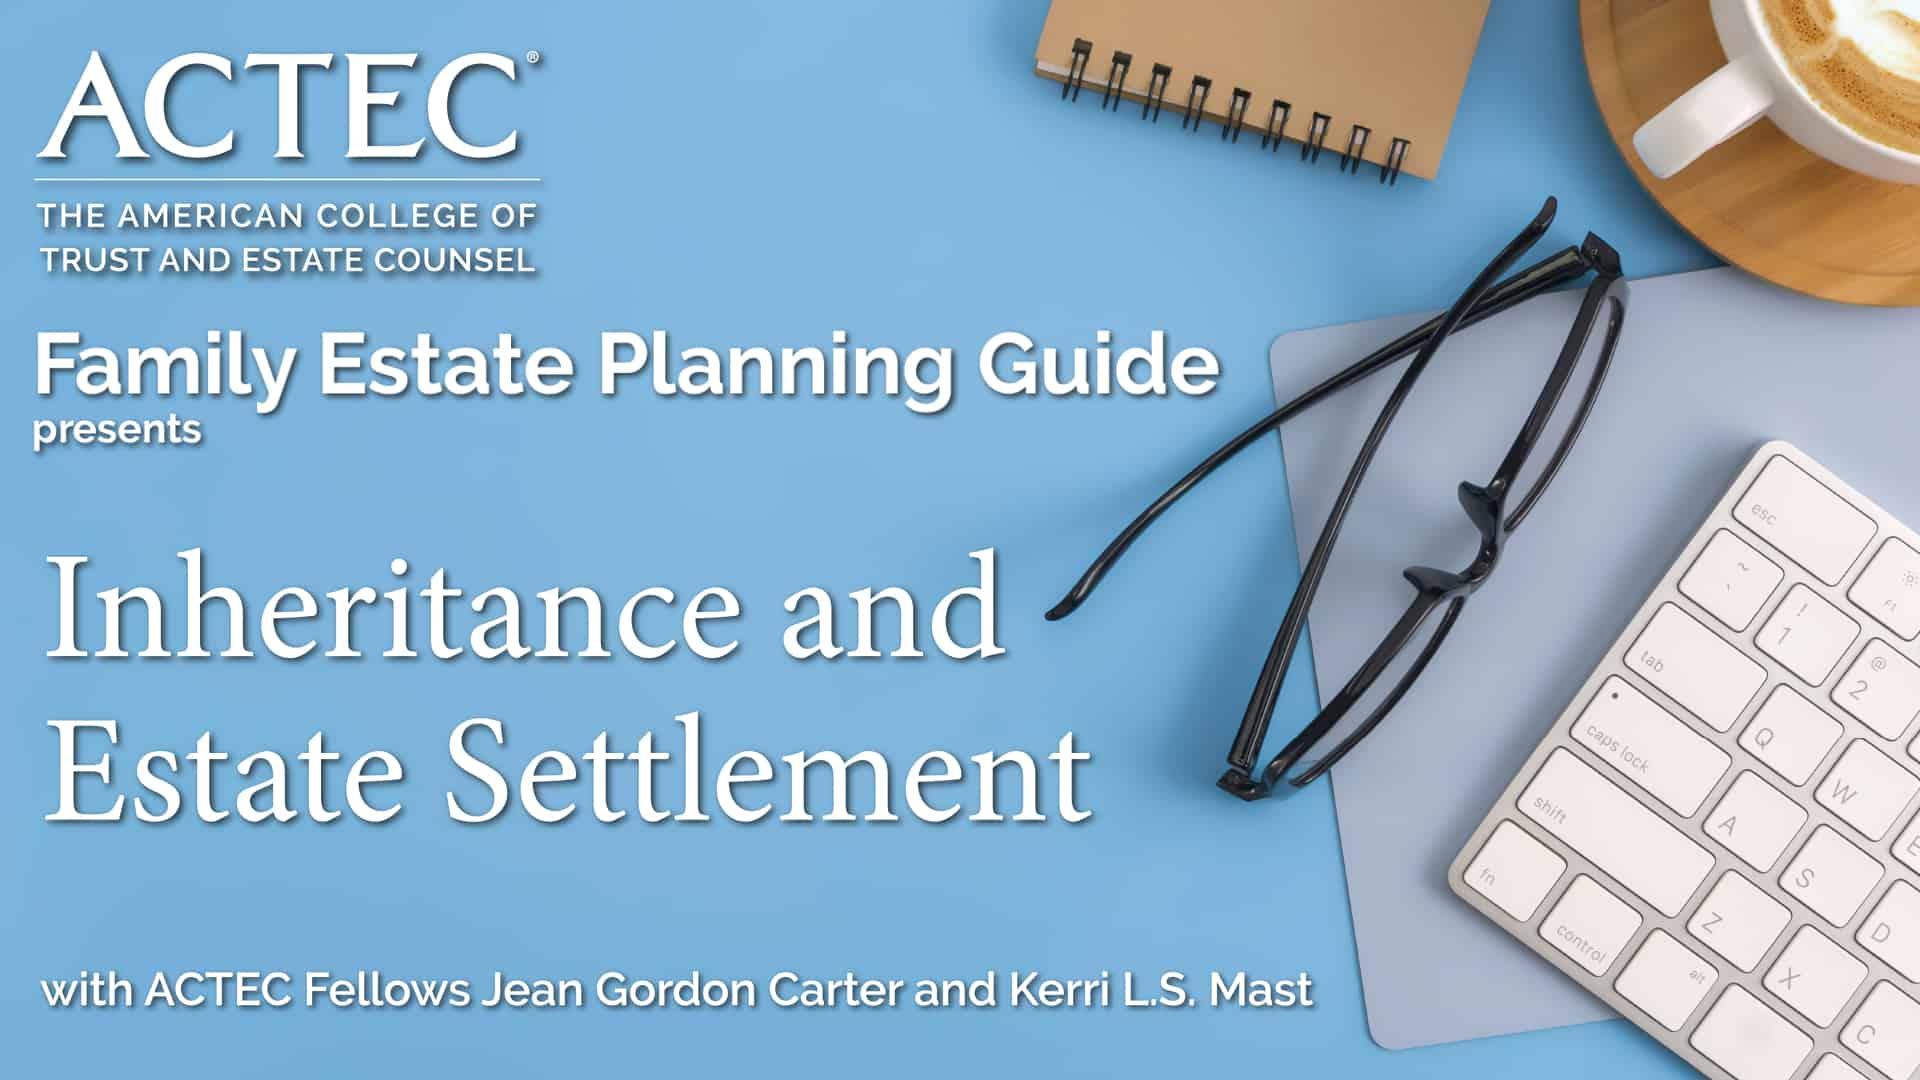 Inheritance and Estate Settlement